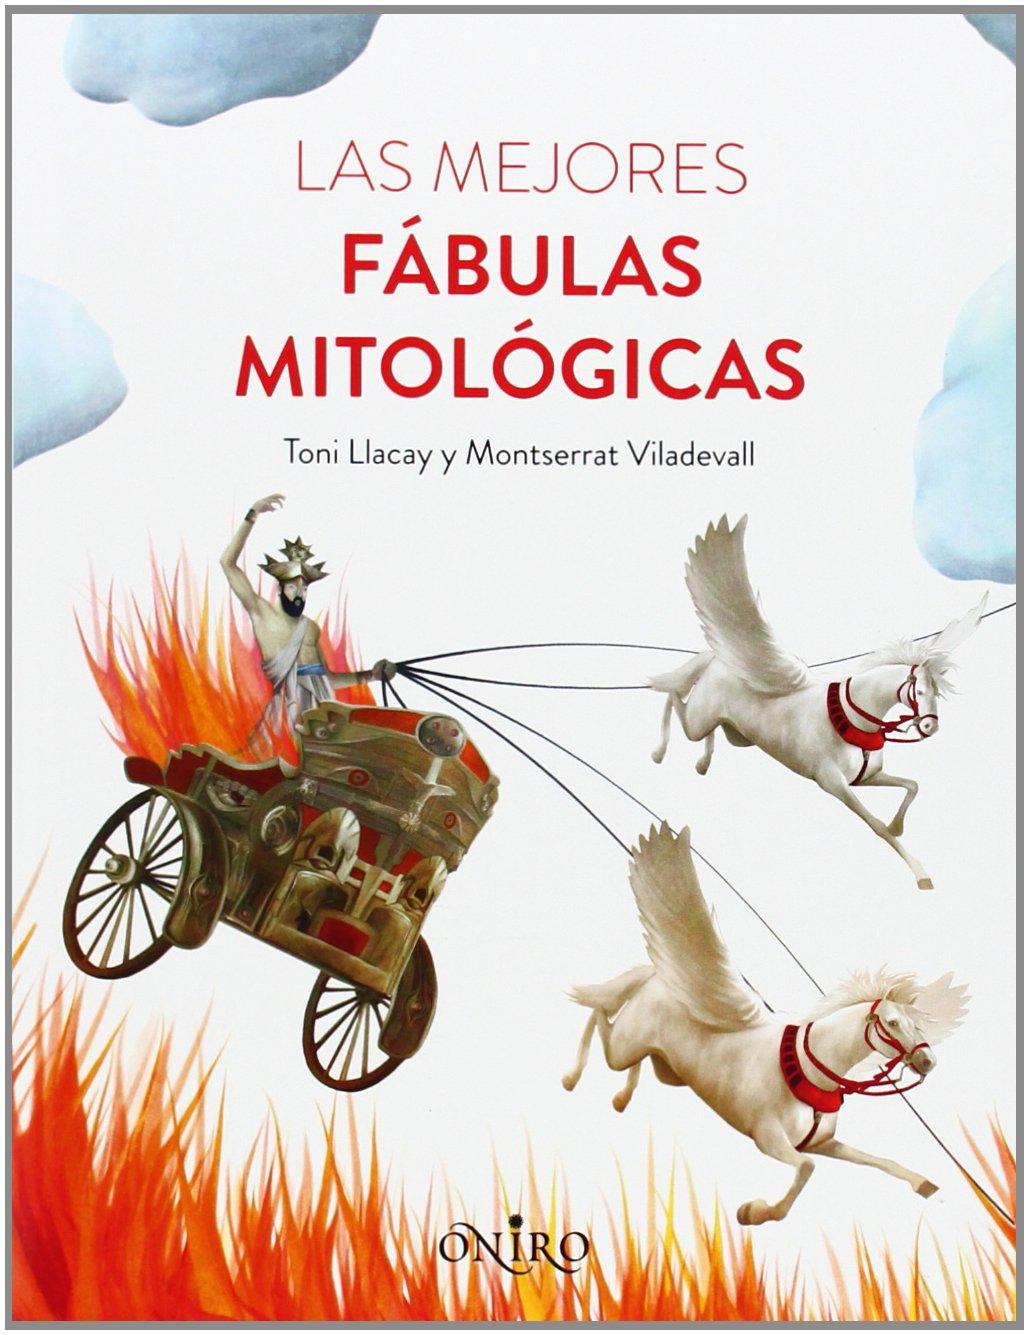 Las mejores fábulas mitológicas (Spanish Edition) PDF